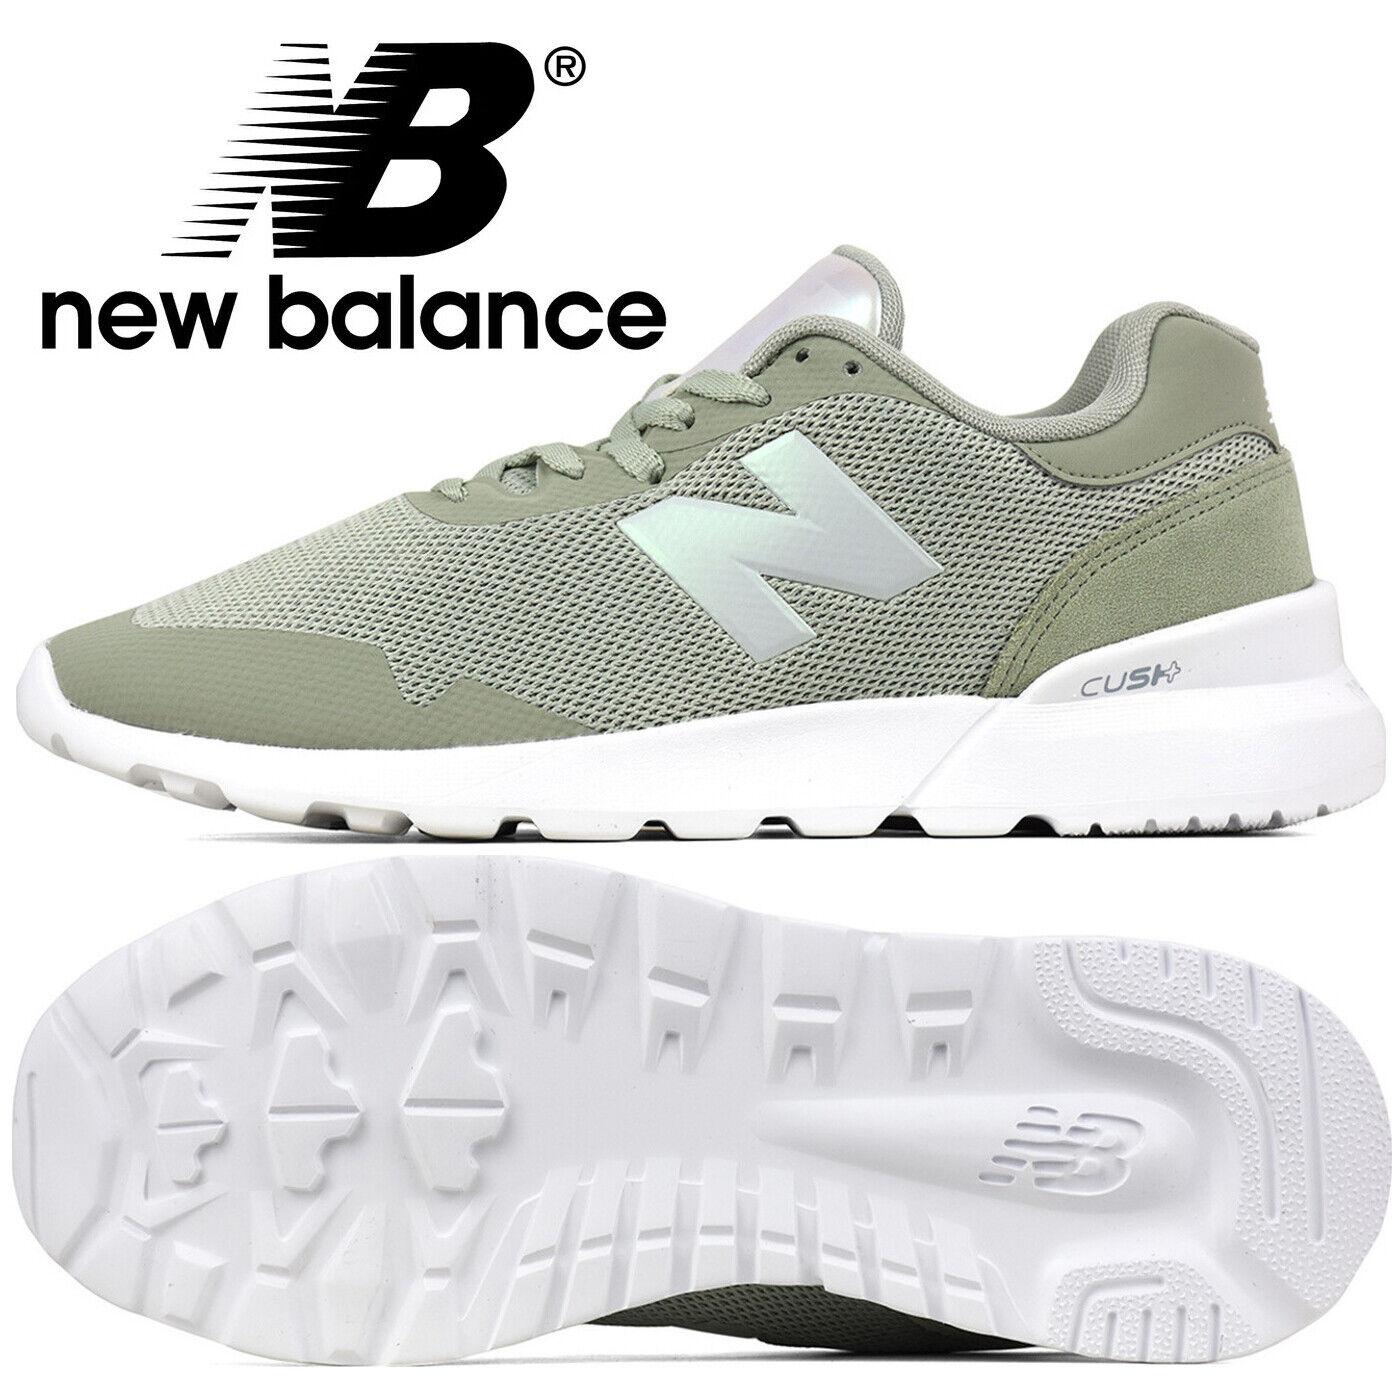 sports direct new balance sale